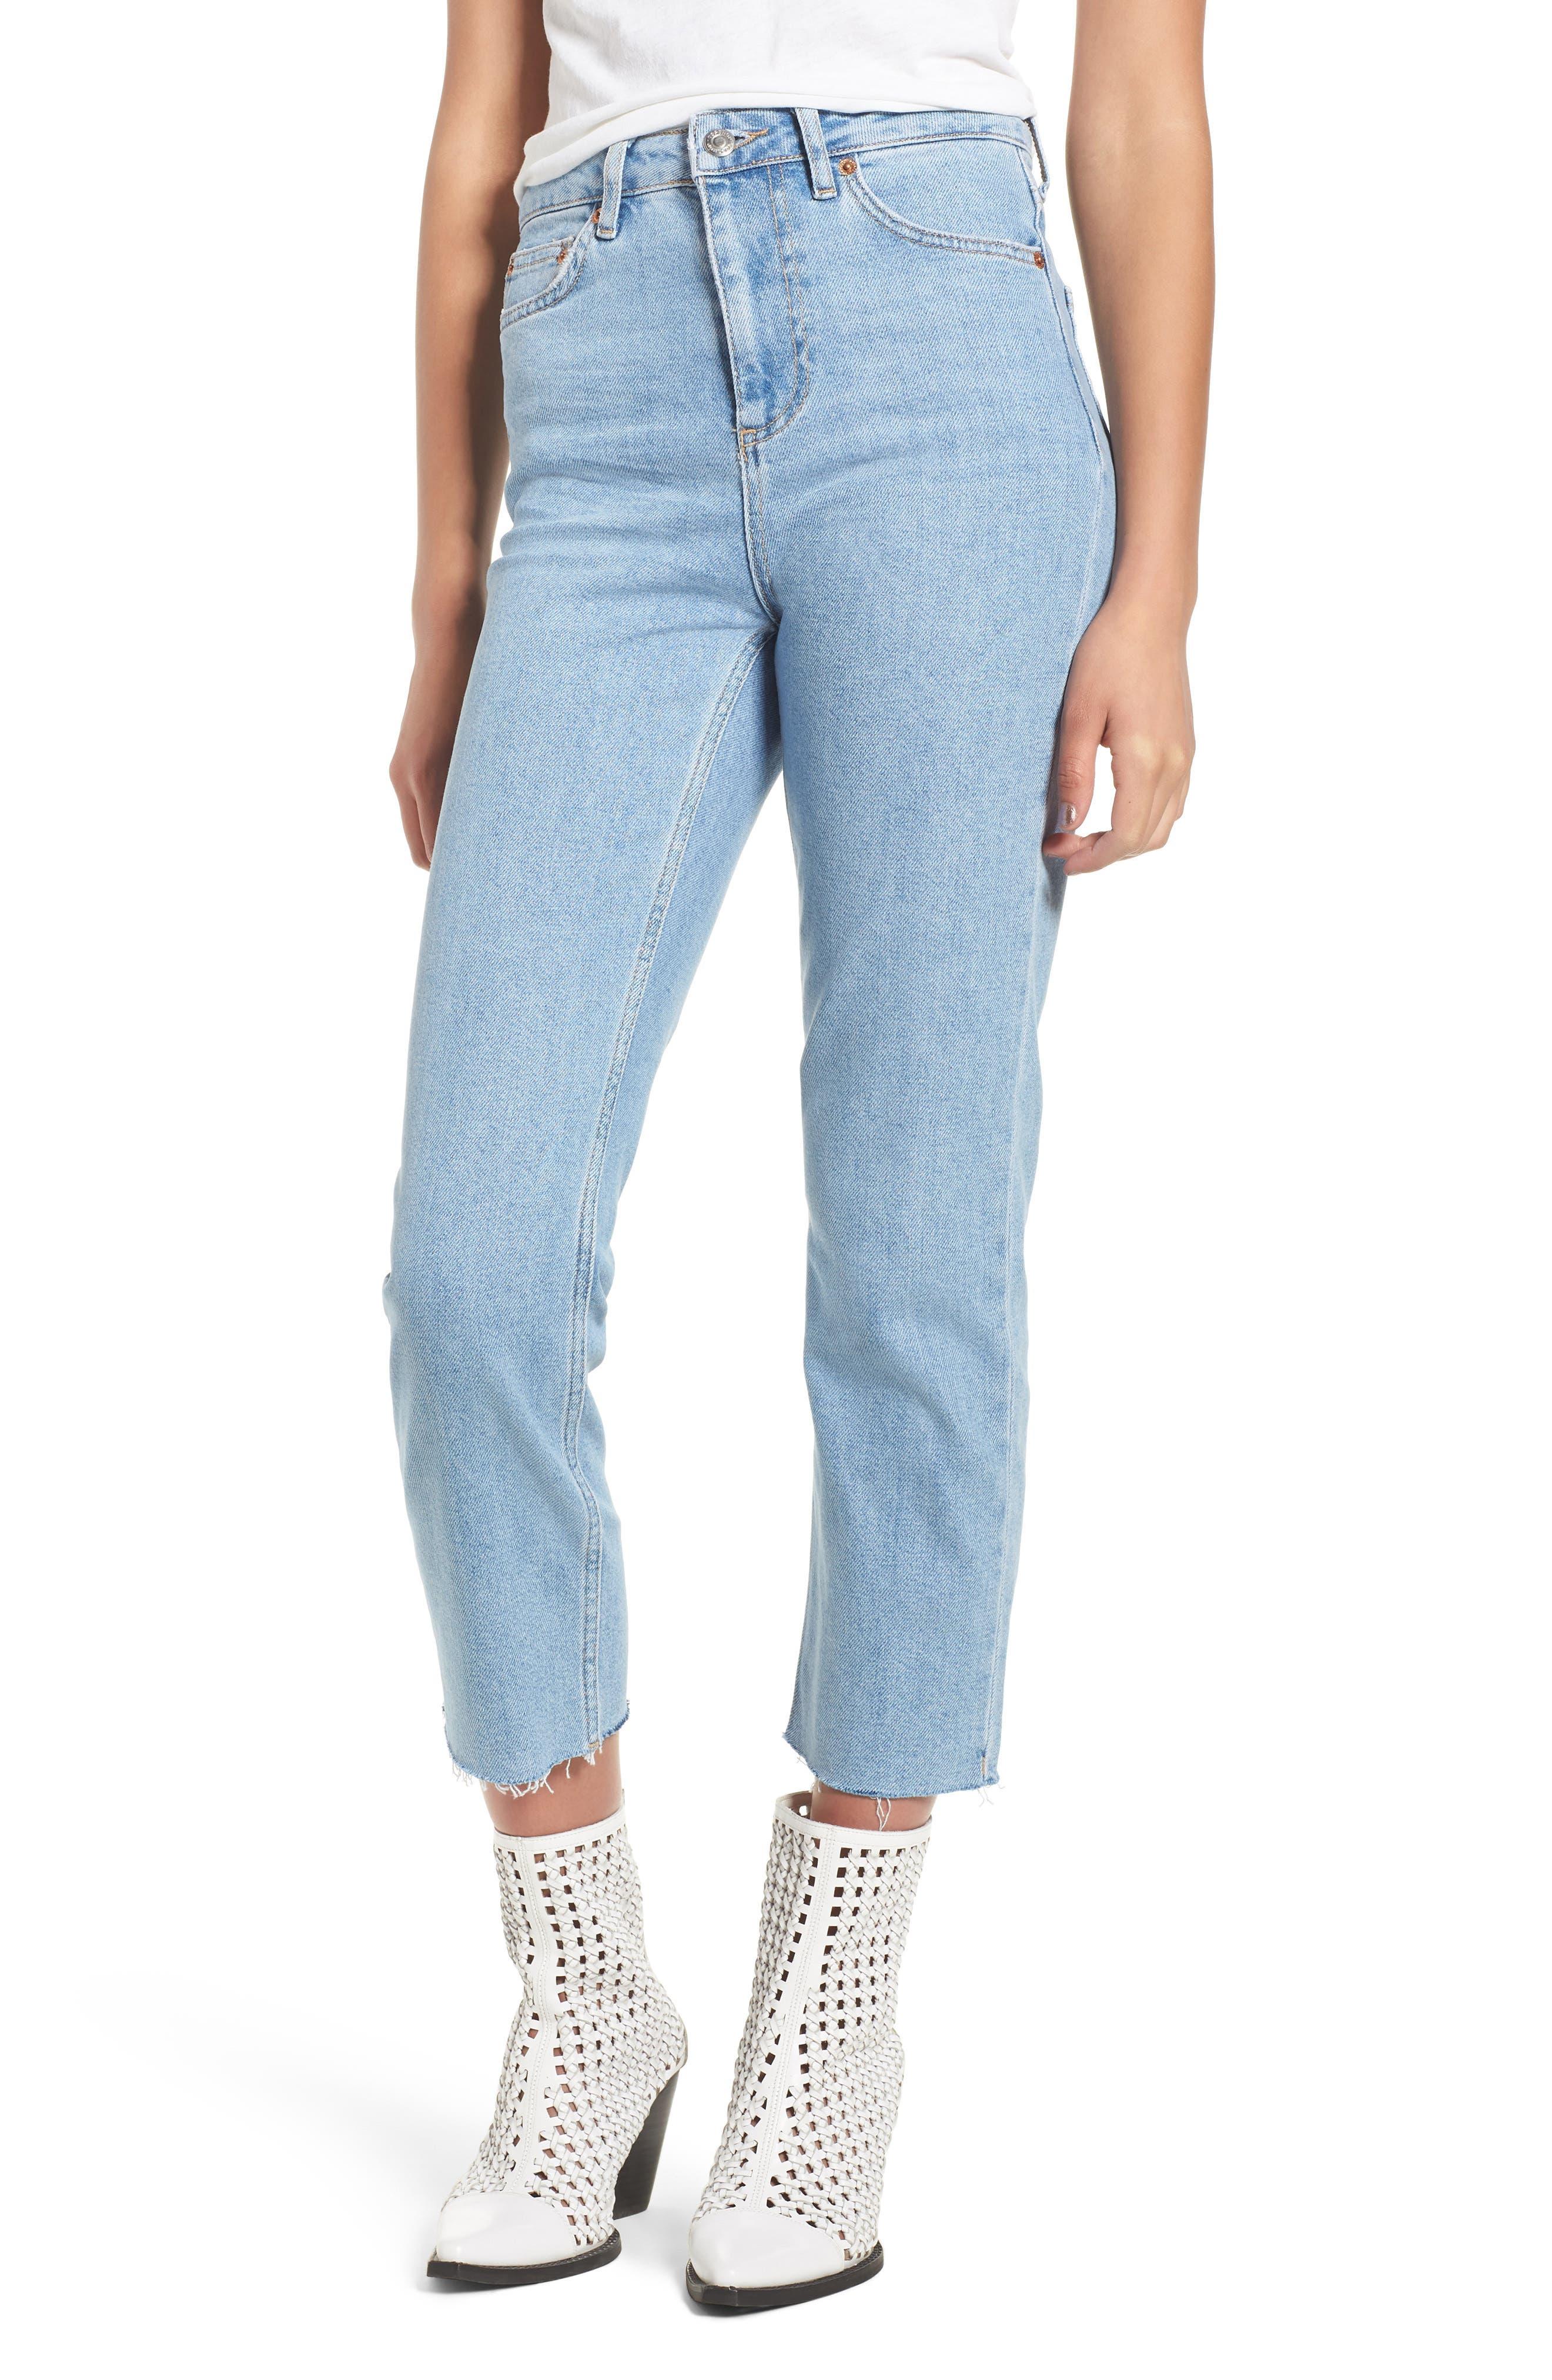 TOPSHOP, Raw Hem Straight Leg Jeans, Main thumbnail 1, color, BLEACH STONE DENIM